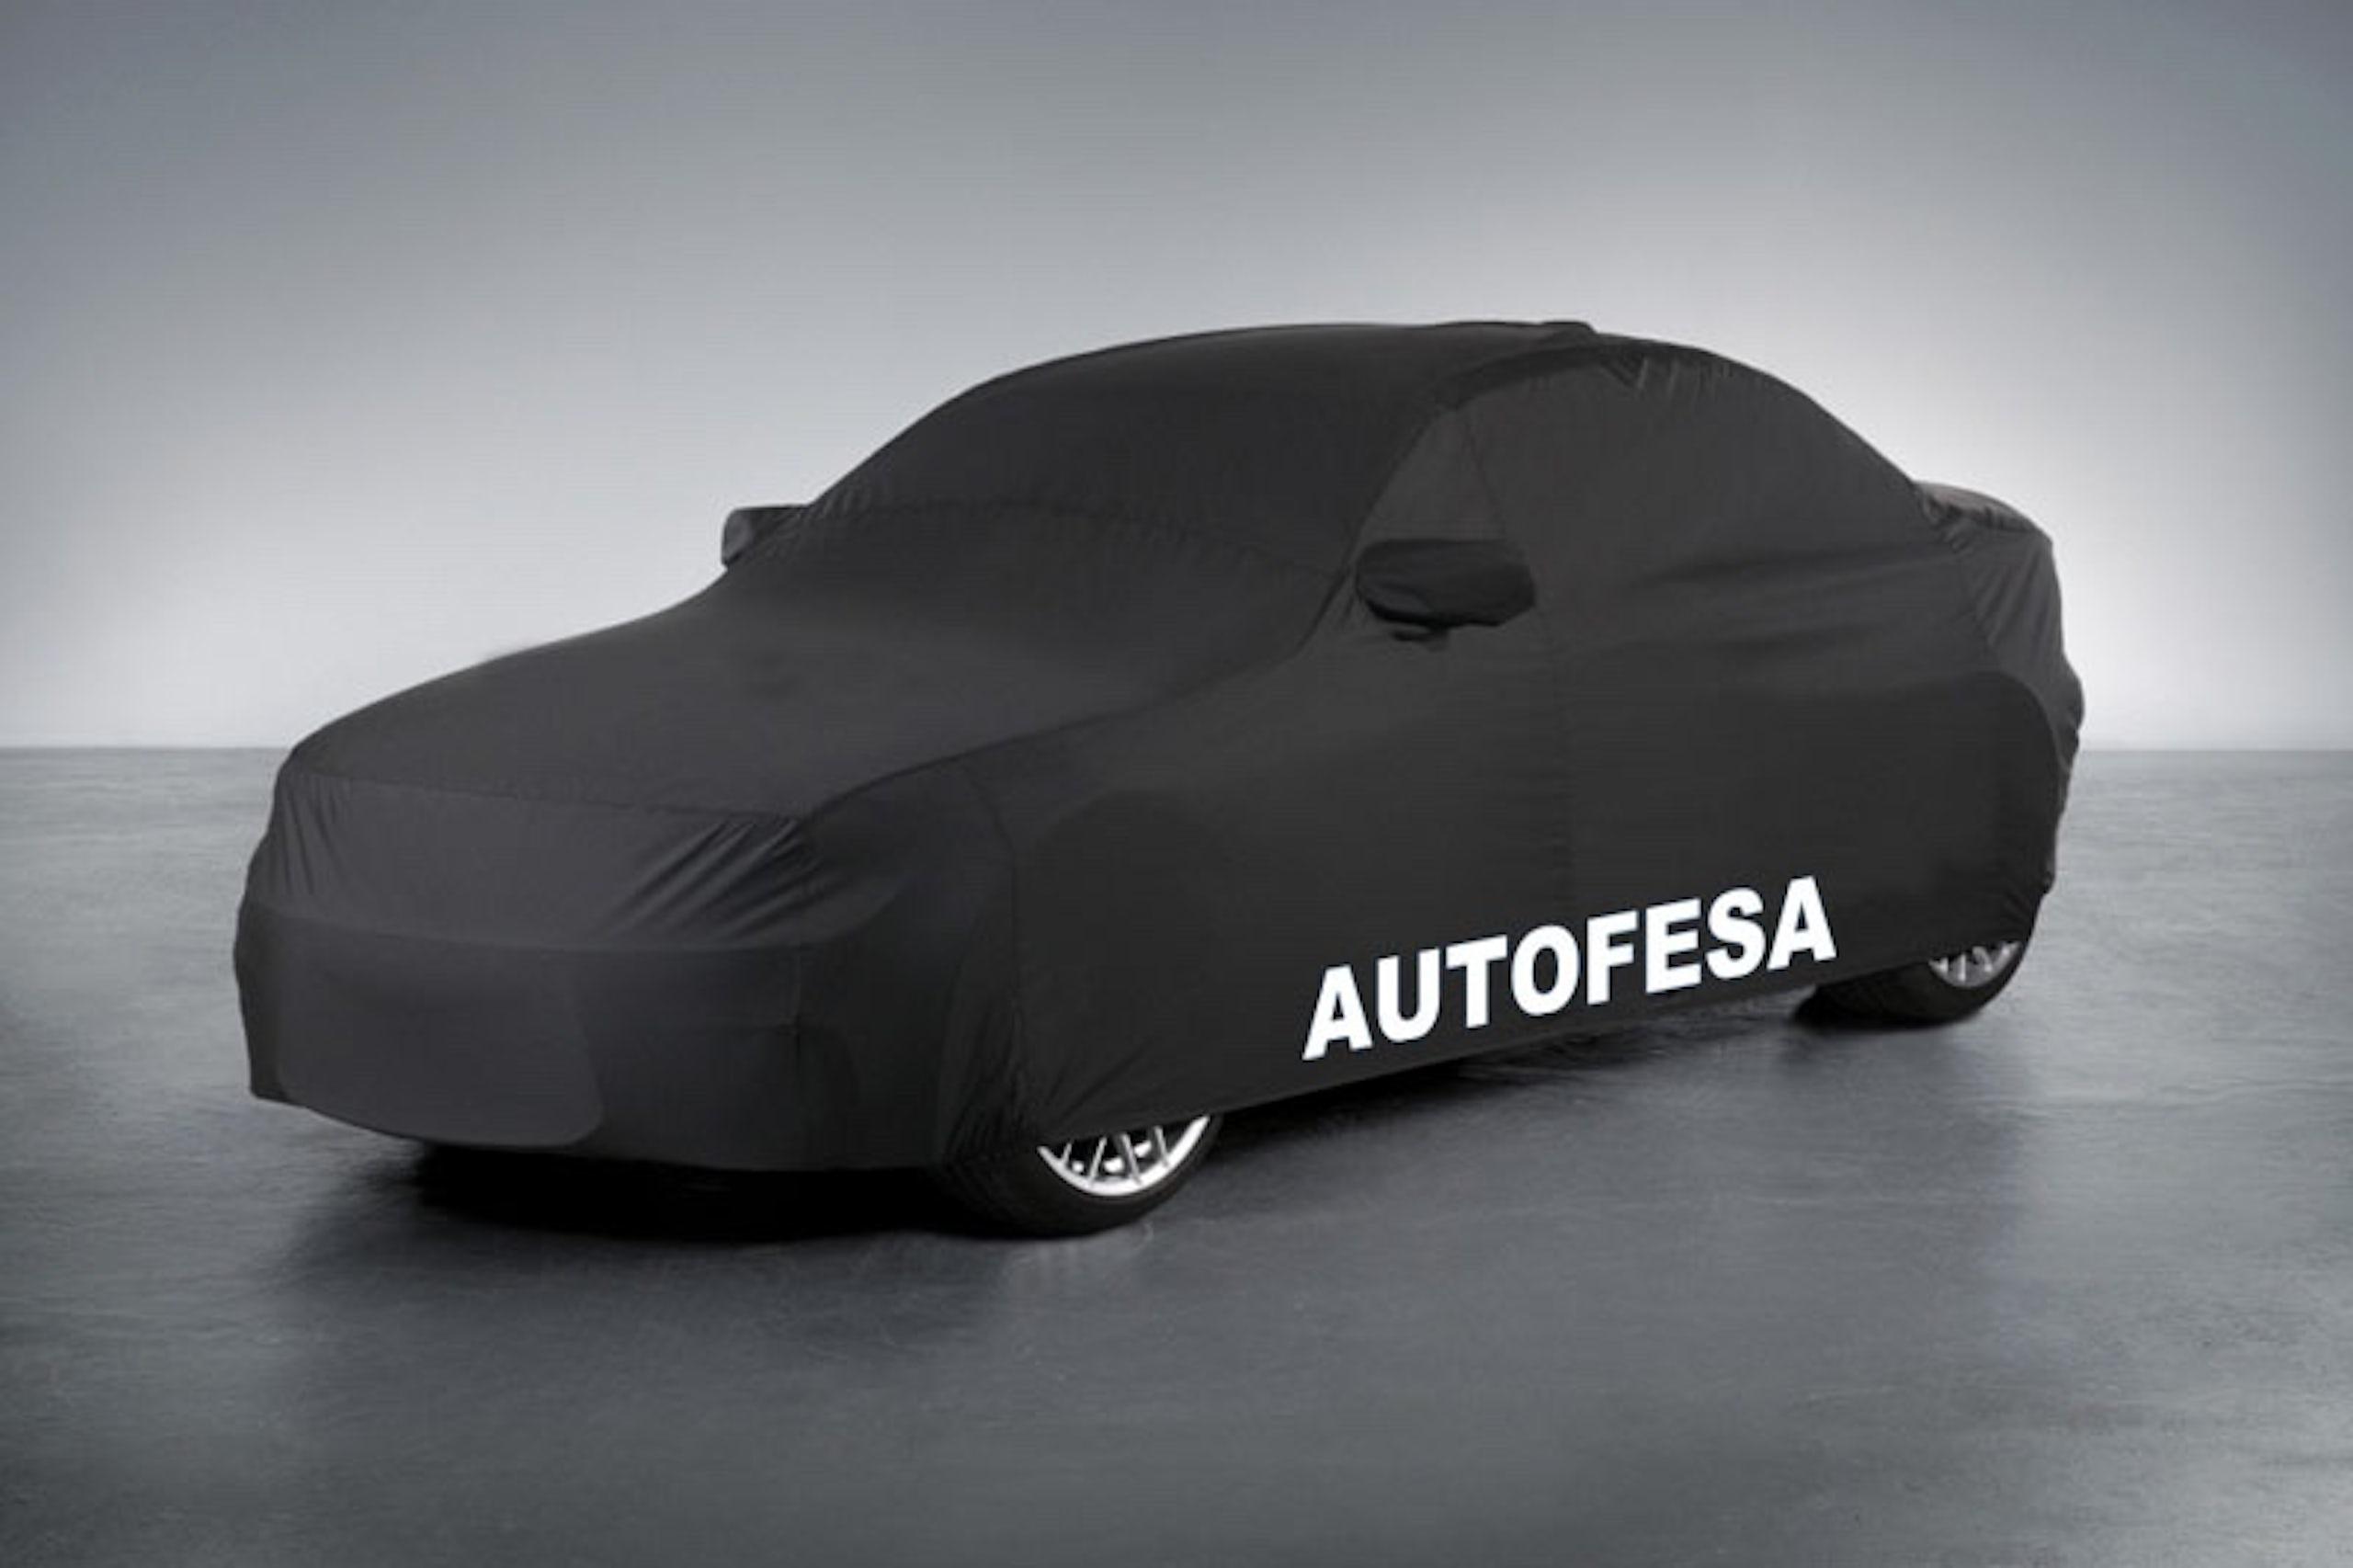 Fotos del Peugeot Satelis 500 SATELIS 500Exterior 1